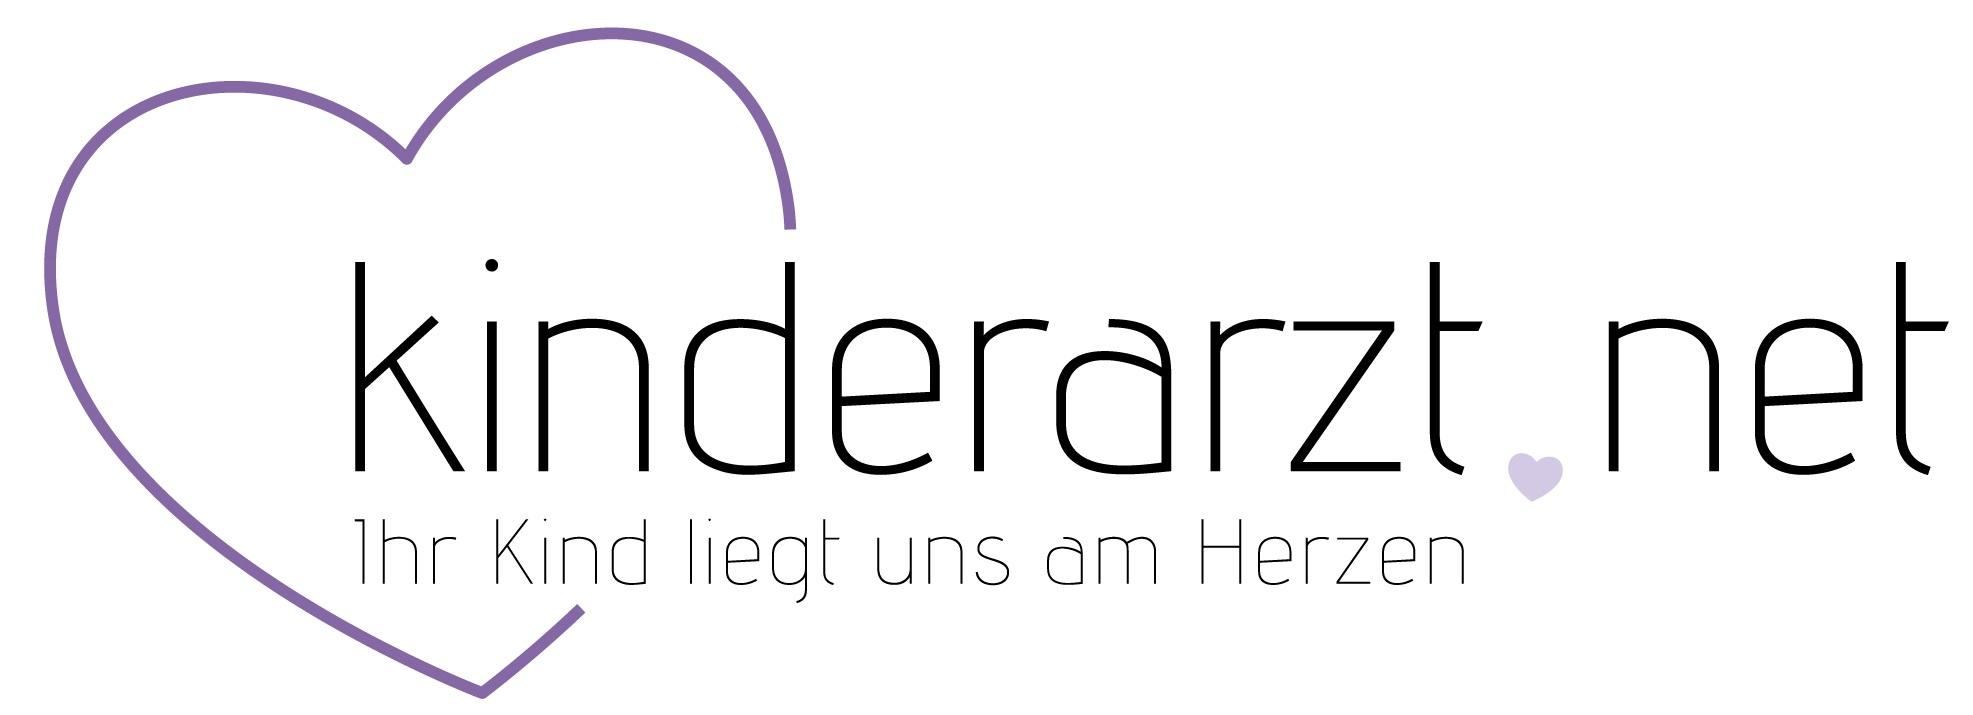 Kinderarzt.net